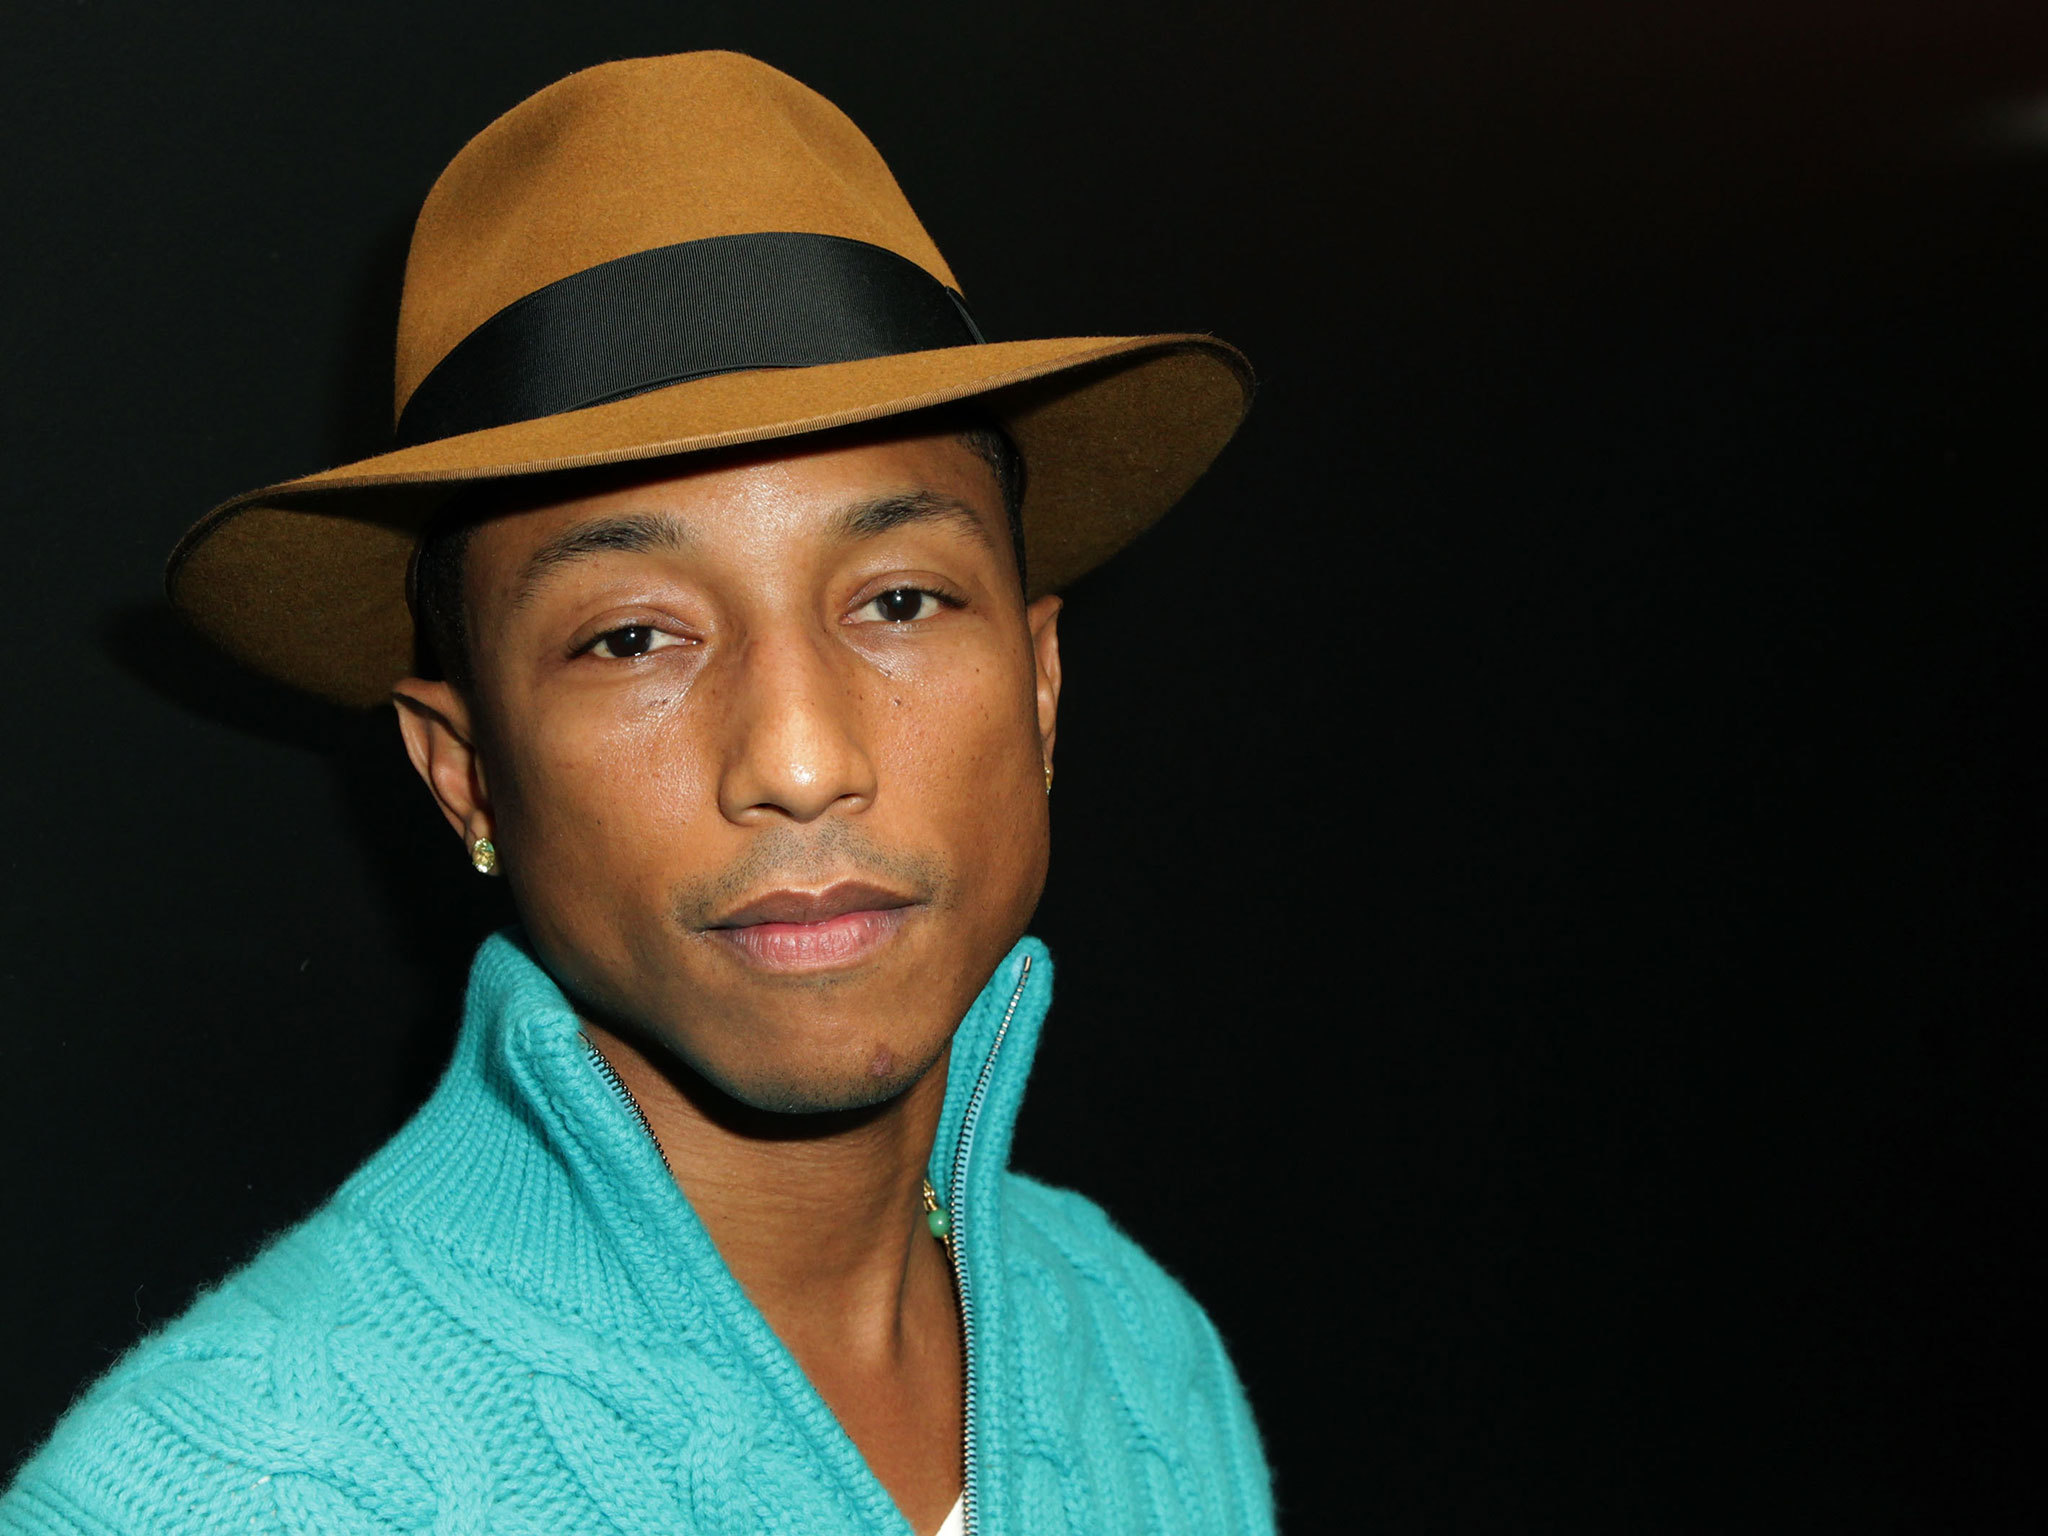 Pharrell Williams Computer Backgrounds